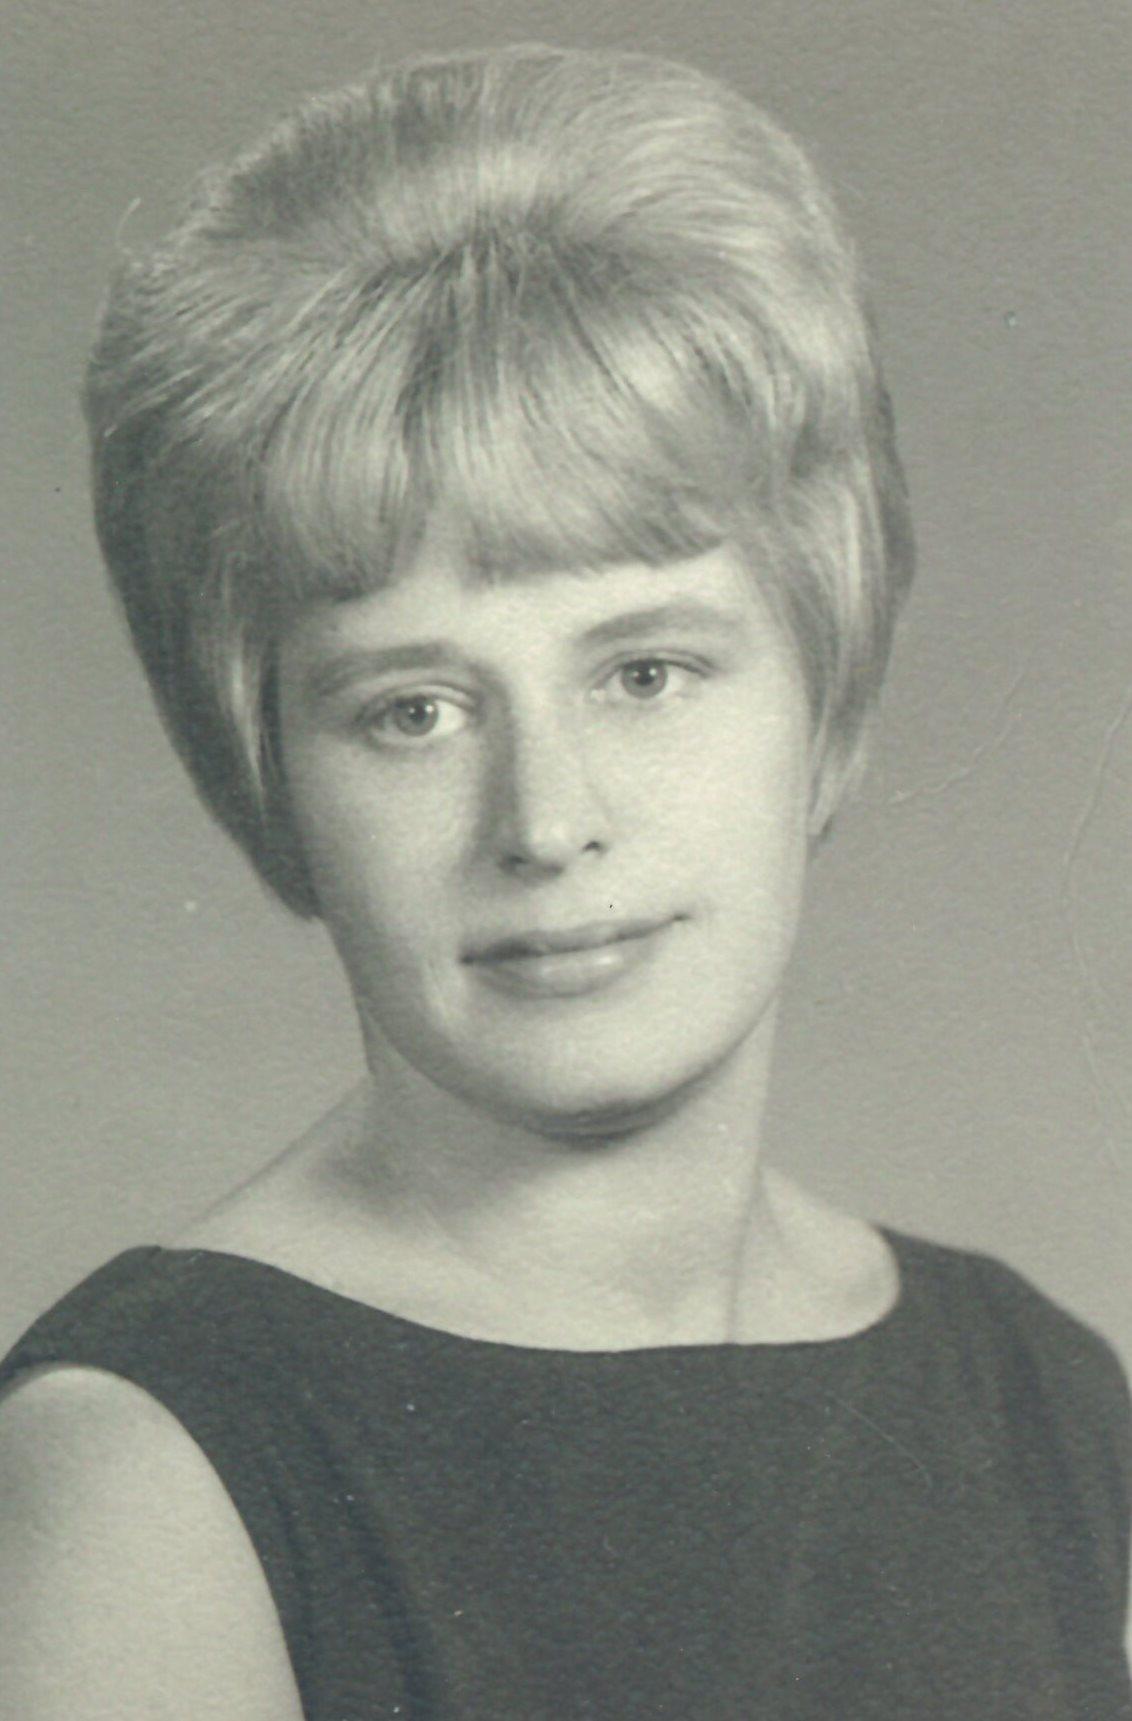 Jacqueline Marie Lynch